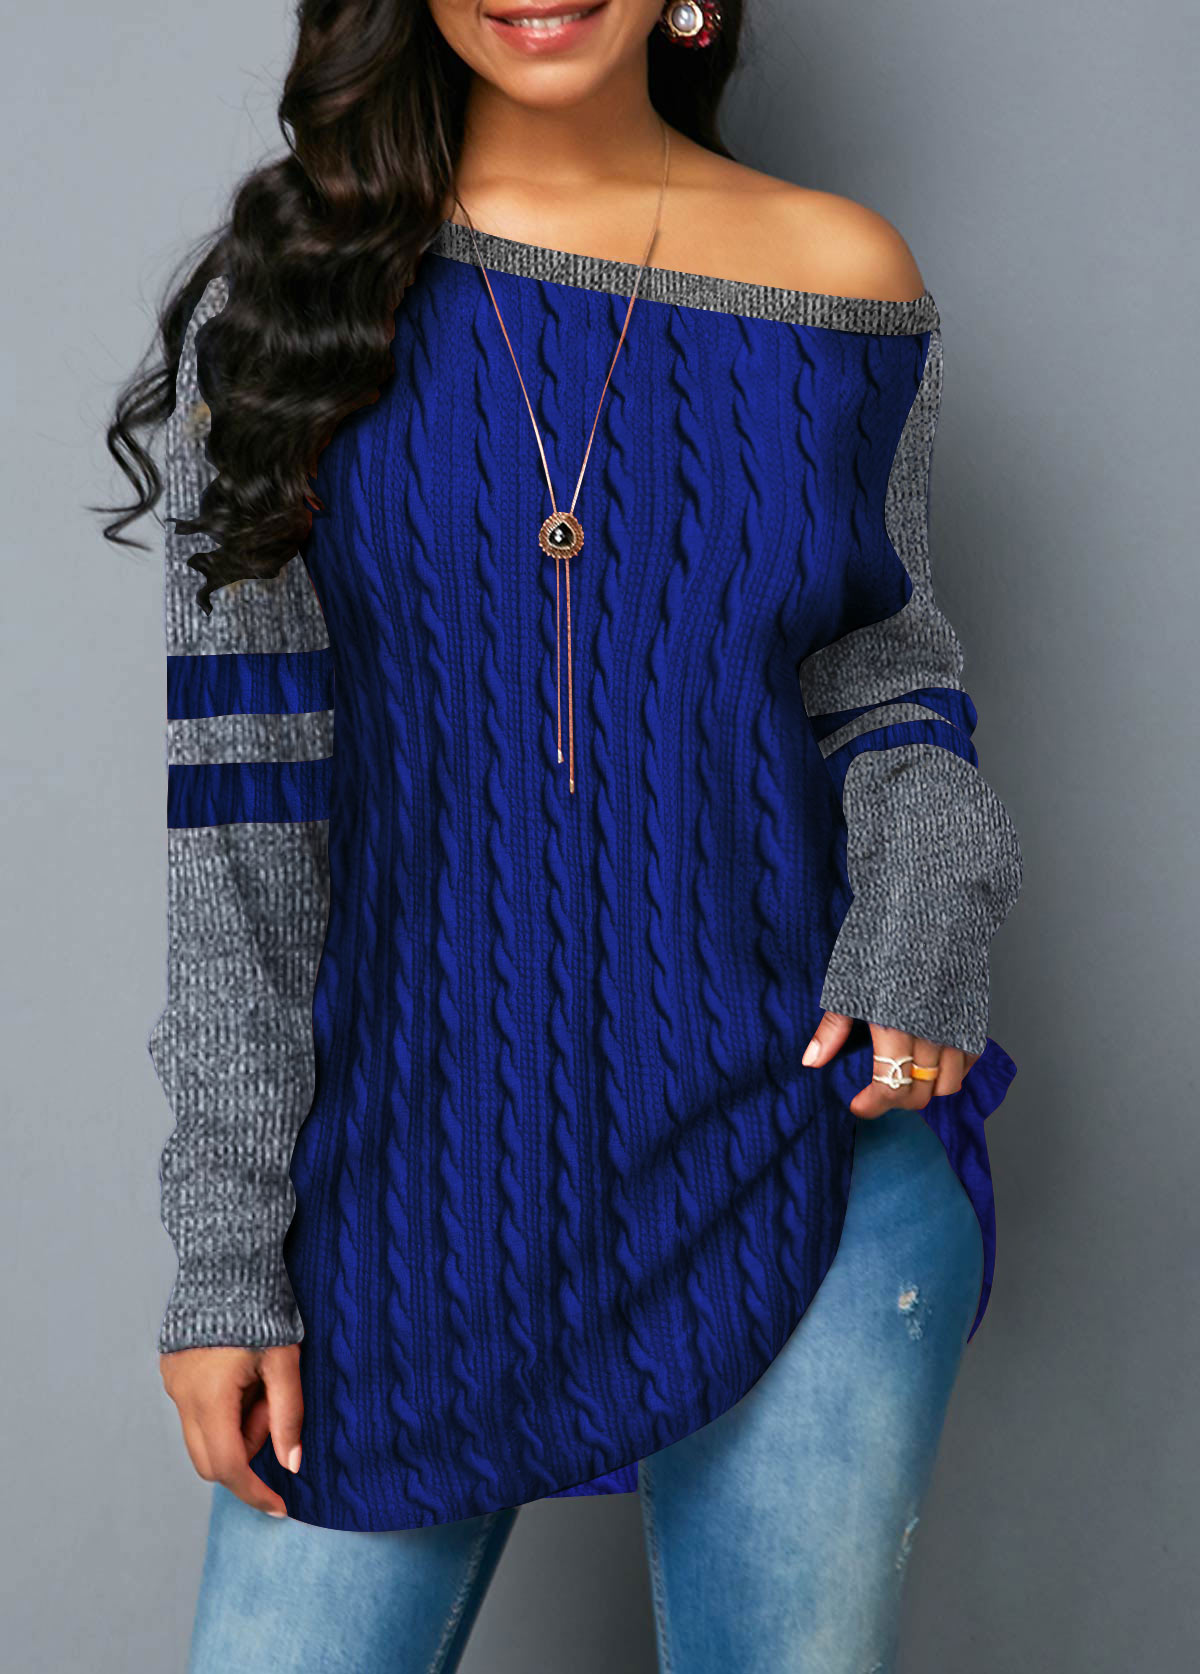 Long Sleeve Round Neck Navy Blue Sweatshirt